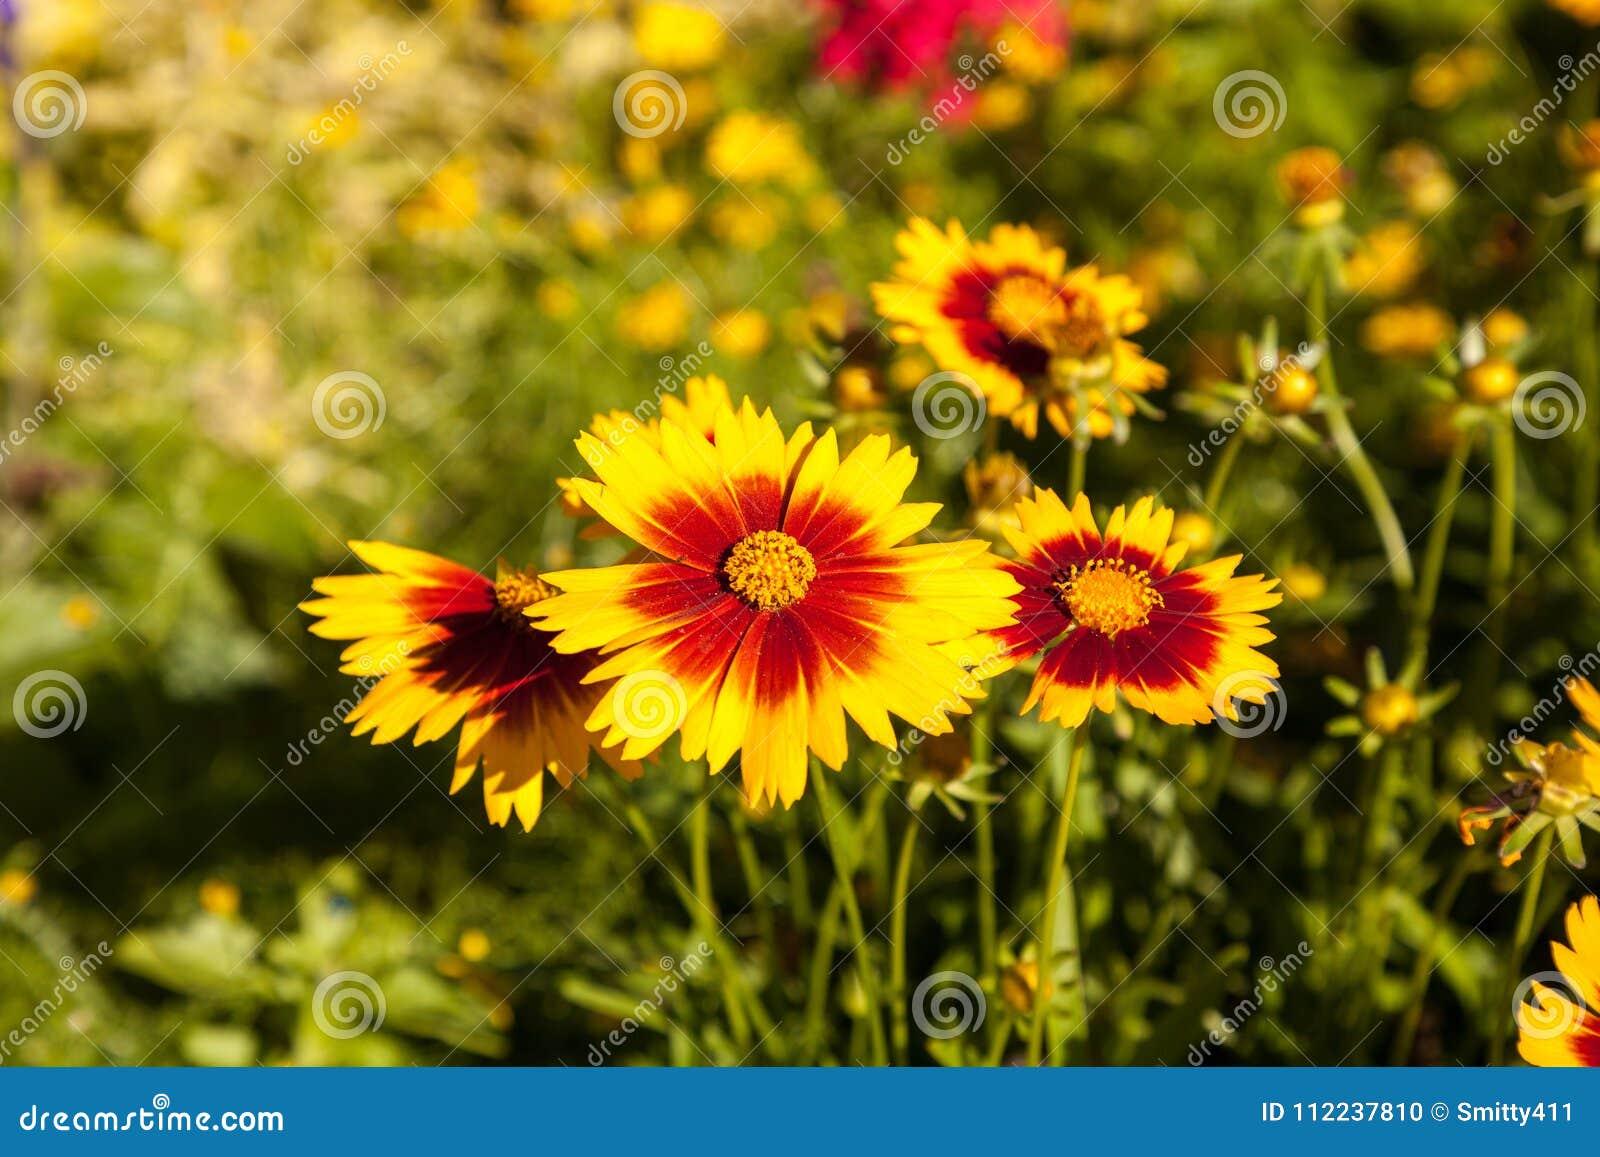 Blanket Flower Yellow Daisy With Red Center Called Gaillardia Pu